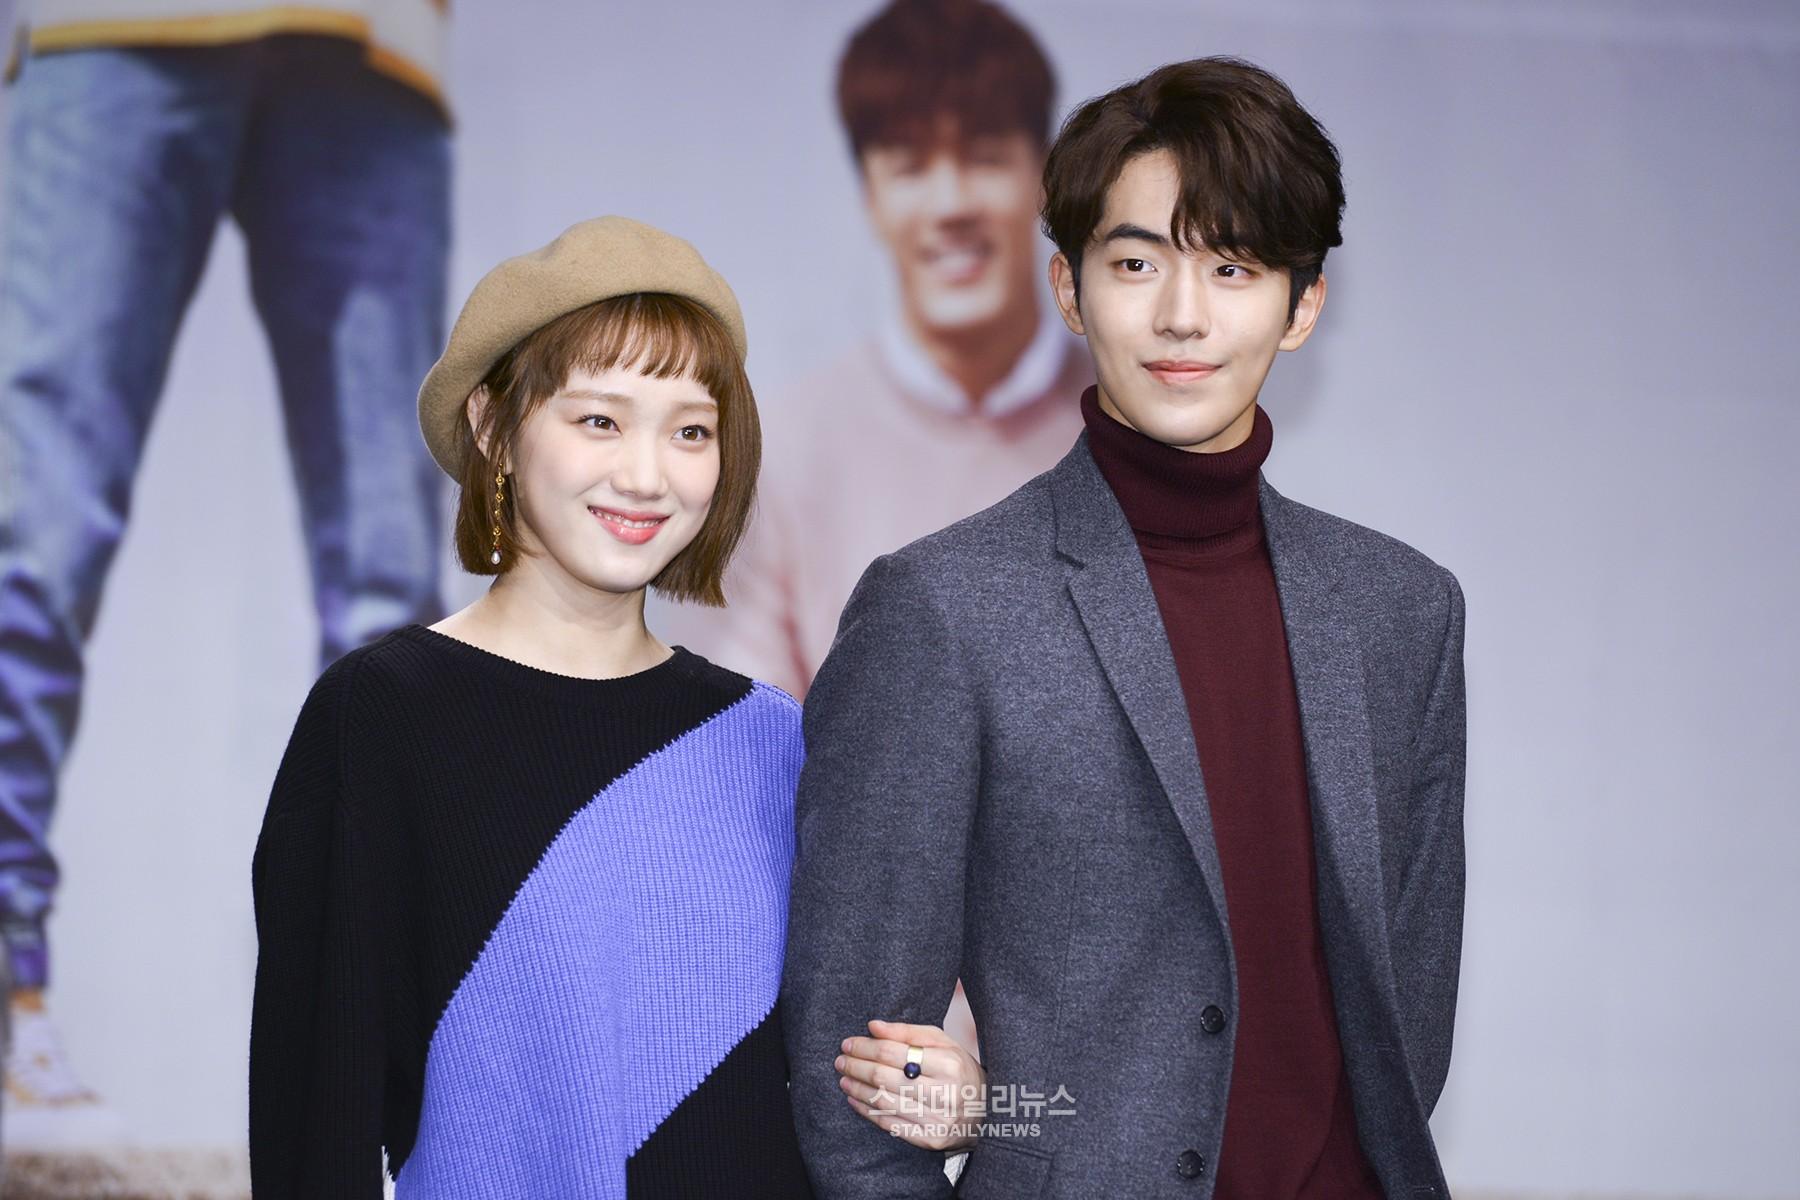 Lee Sung Kyung And Nam Joo Hyuk Talk About Going Up Against Jun Ji Hyun And Lee Min Ho's Drama